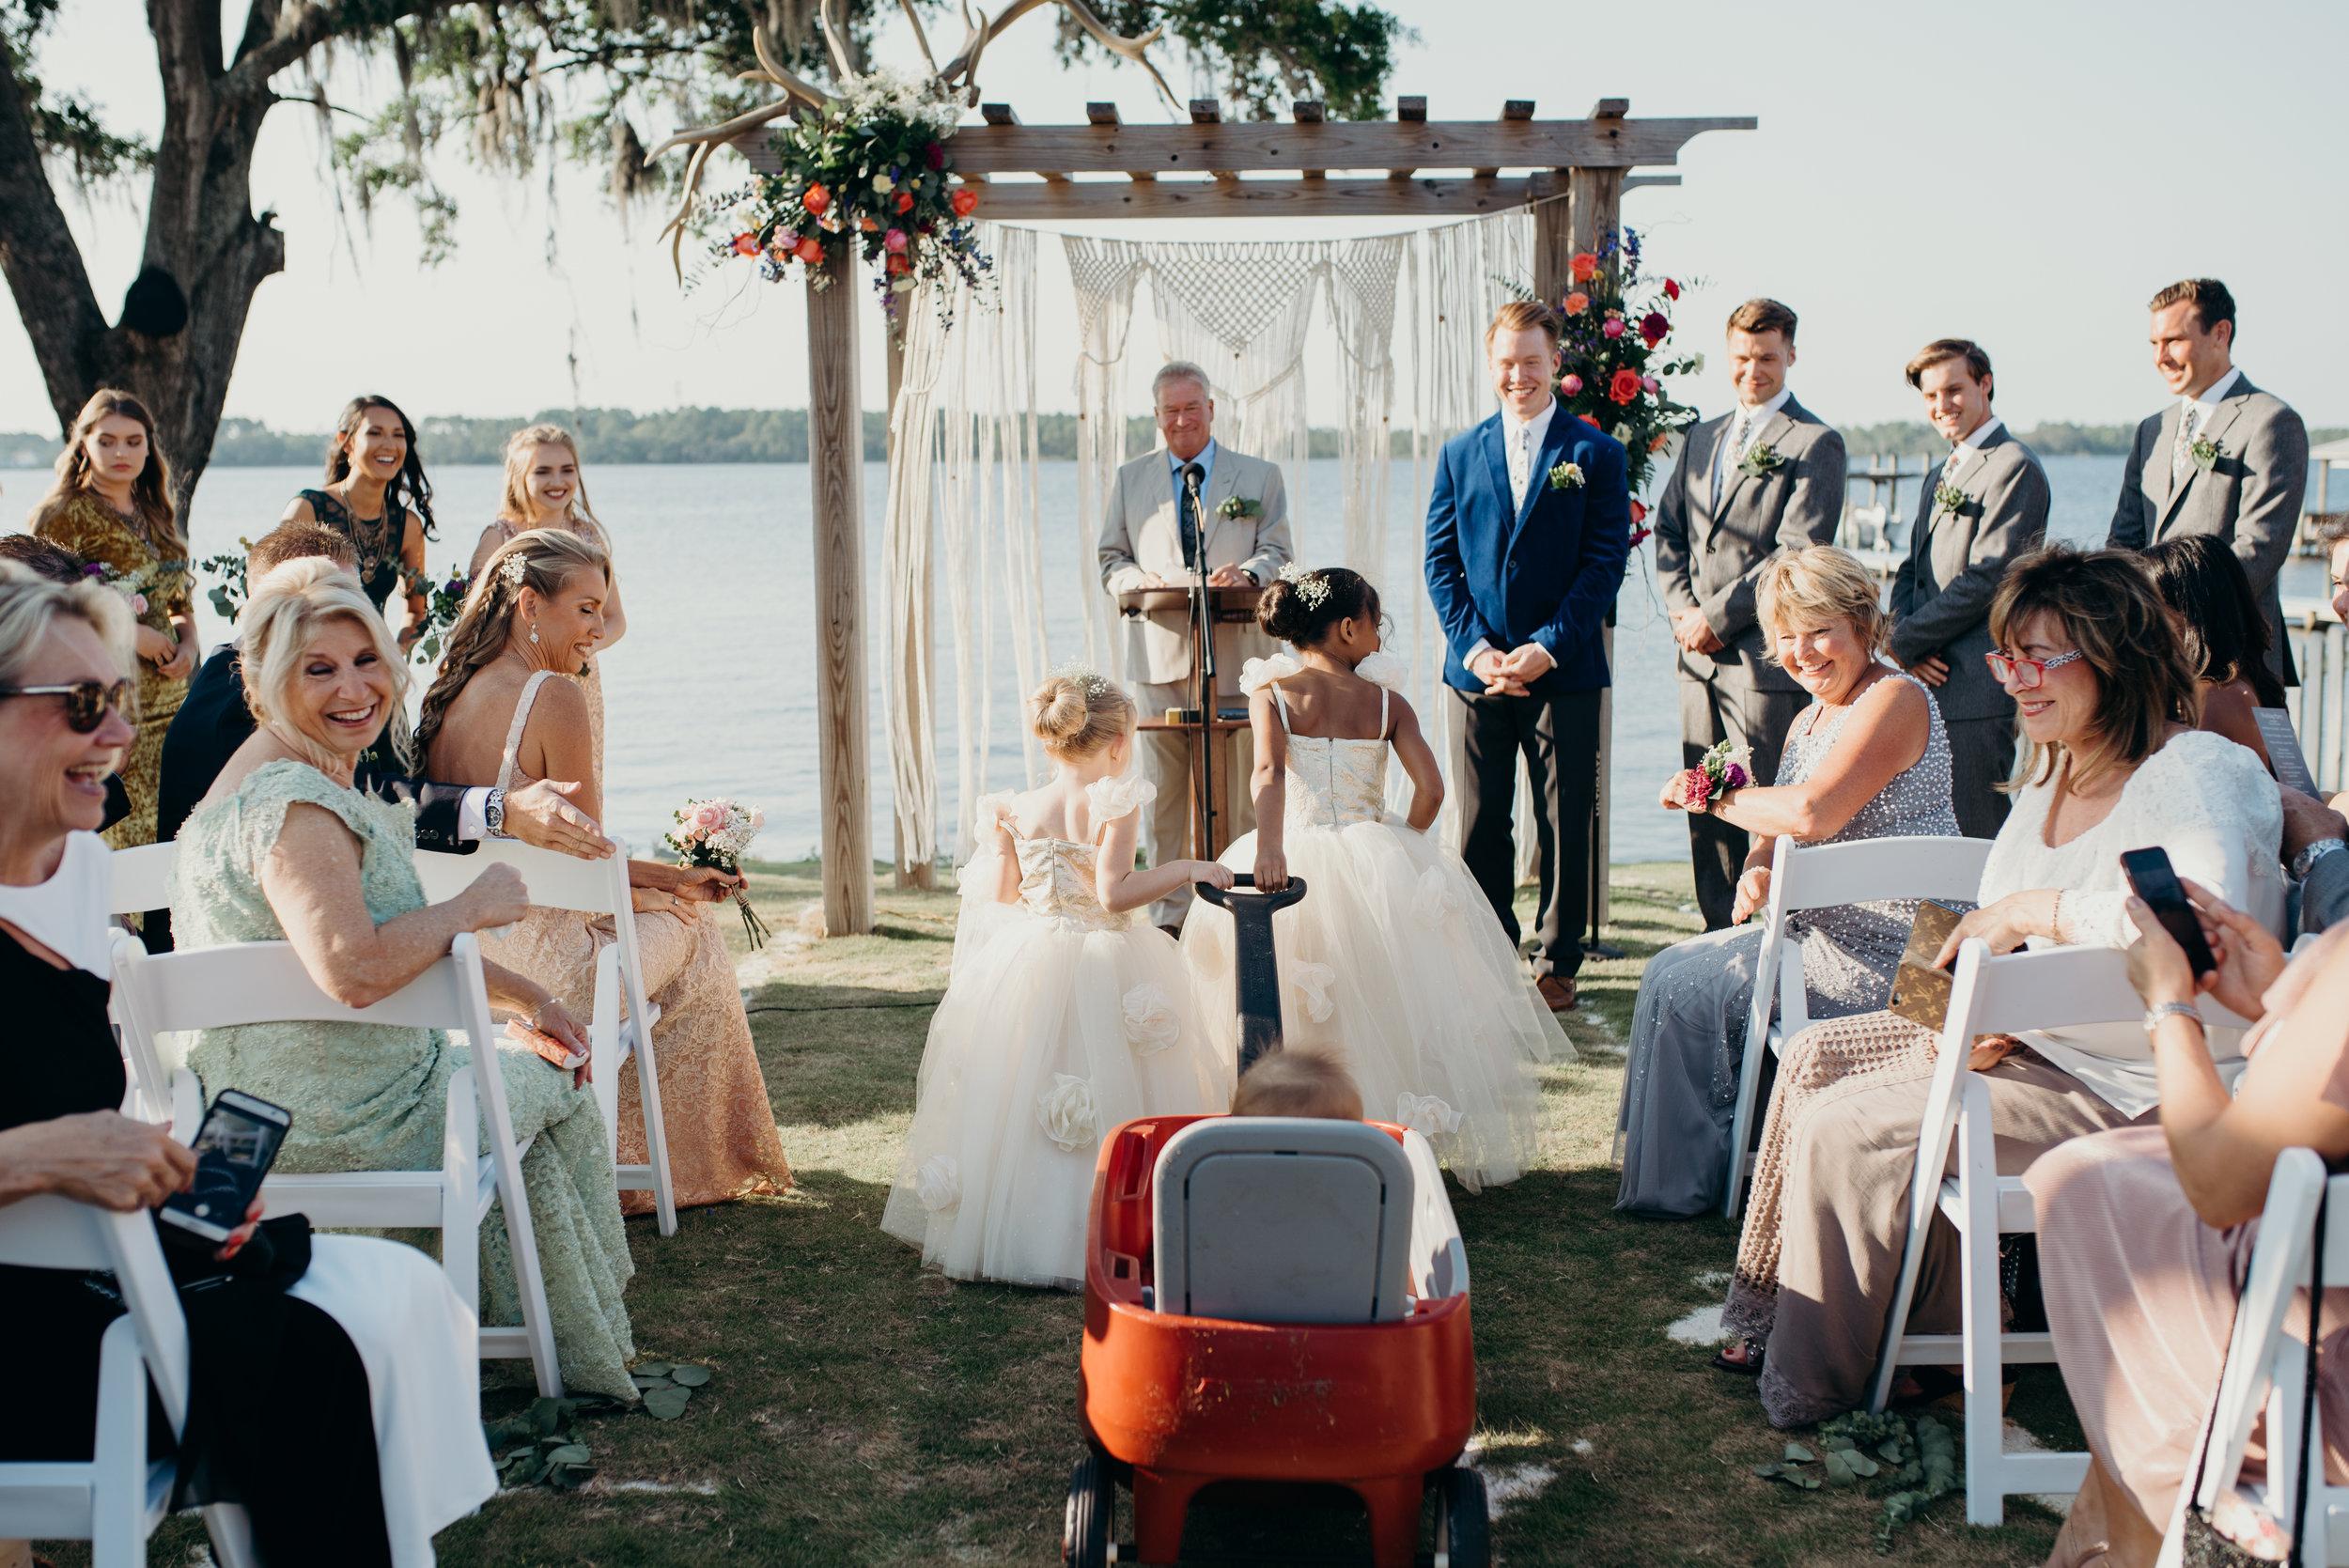 zayda-collin-panama-city-wedding-photography-trippy-bohemian-lisa-frank-wedding-ceremony-144.jpg